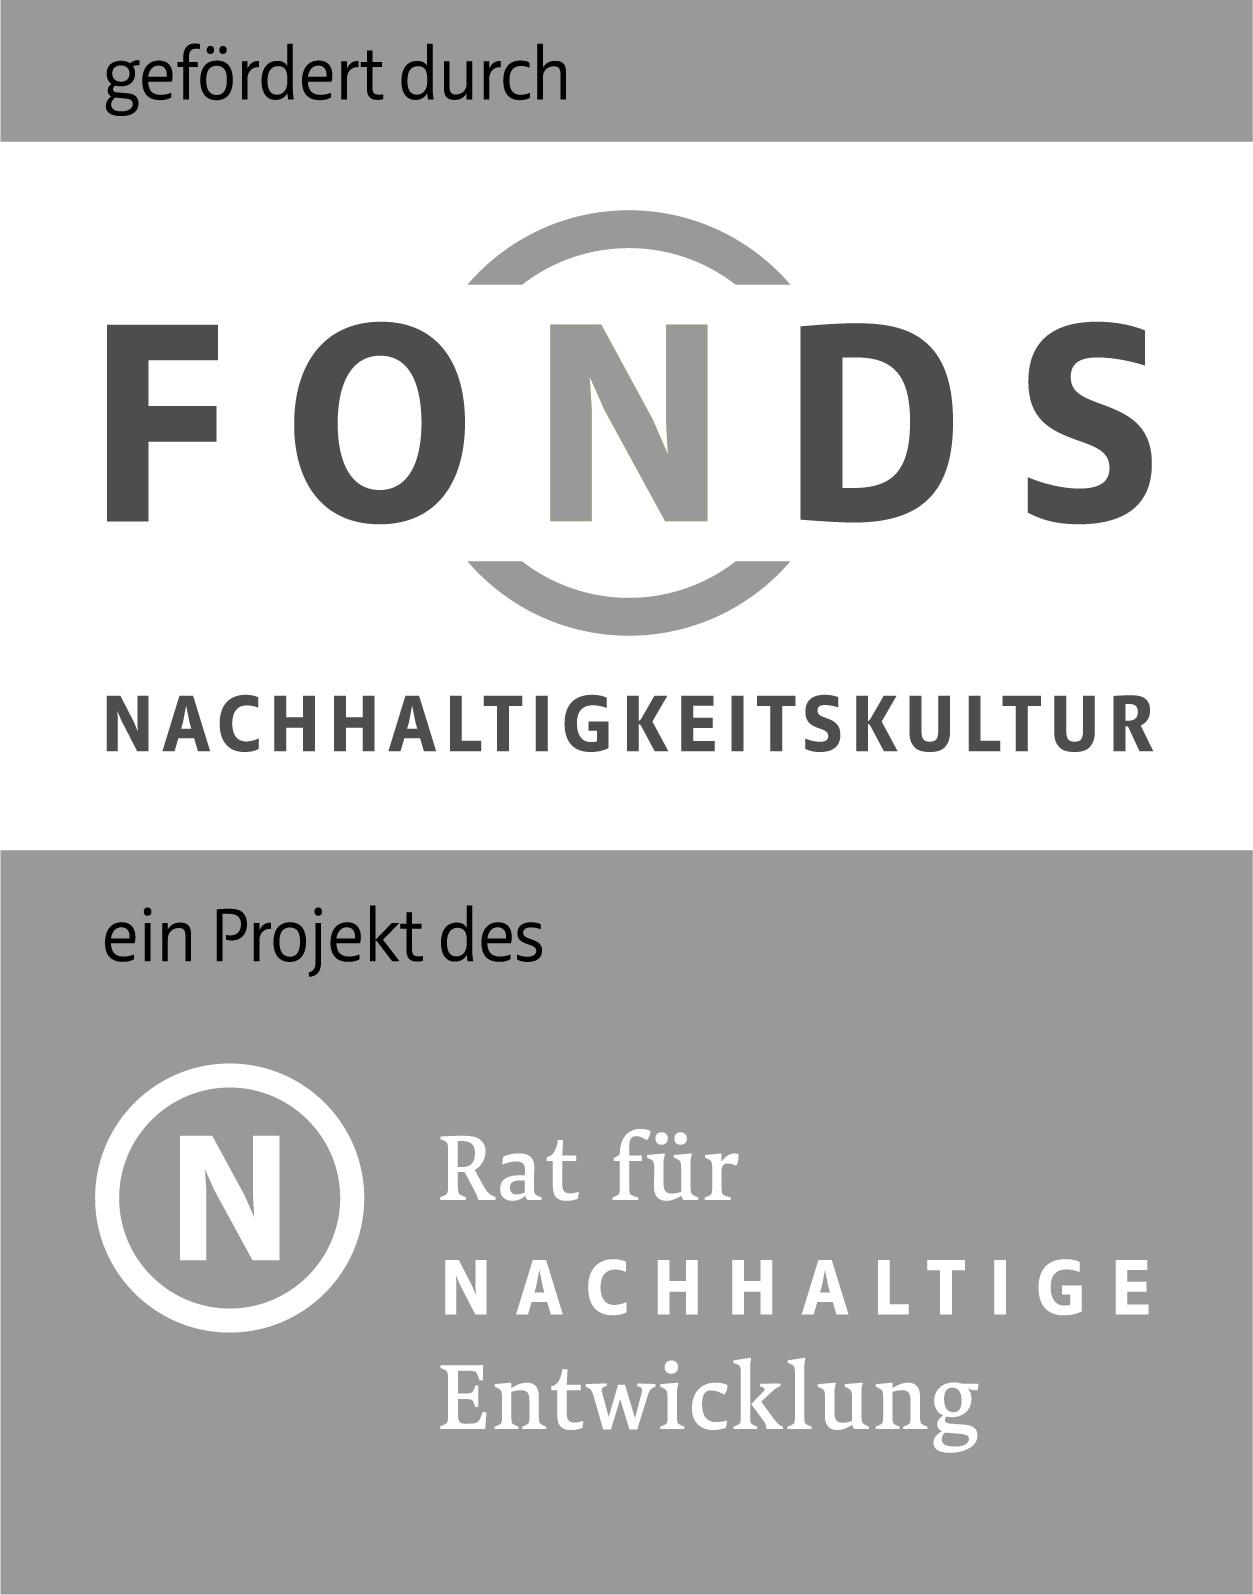 RNE_NFonds_Signet_gefoerdert_L_grau